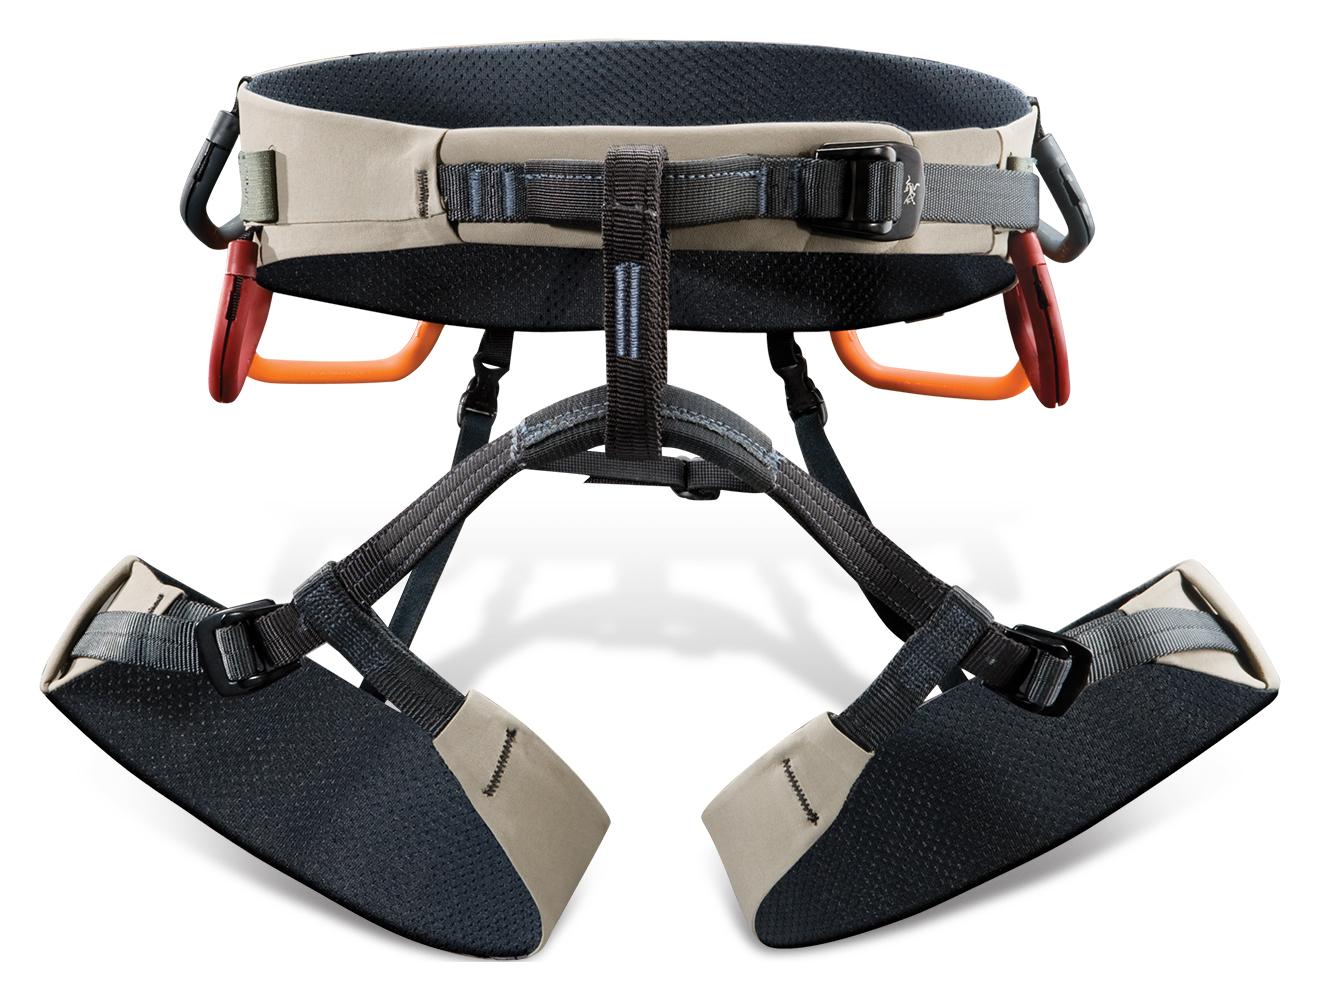 Mammut Klettergurt Zephir : Outdoor kletterschuhe und klettergurte kletterszene